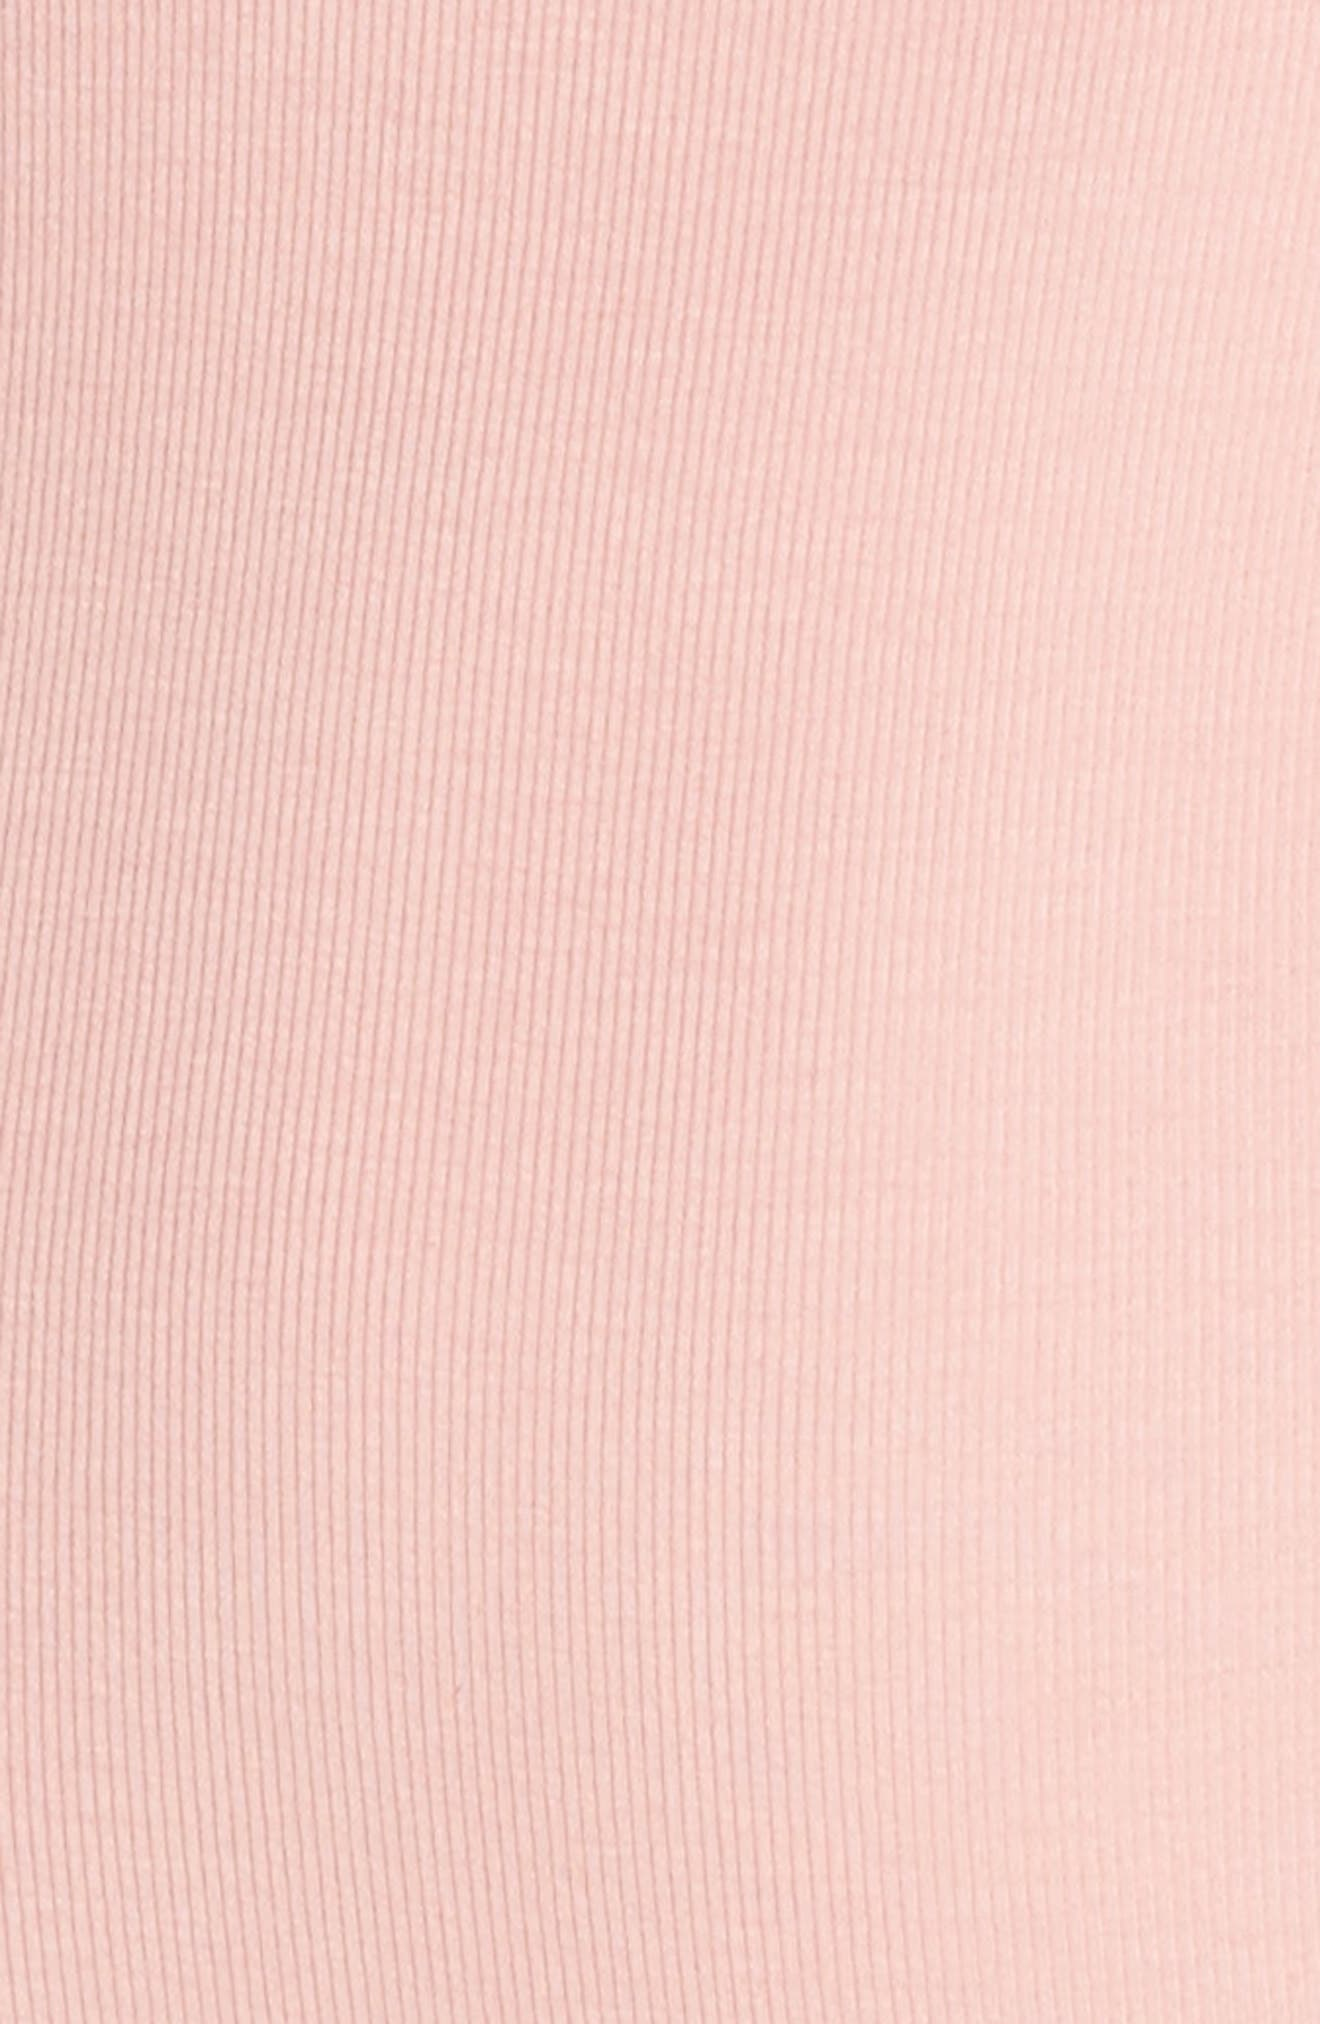 Sasha One-Shoulder Thong Bodysuit,                             Alternate thumbnail 10, color,